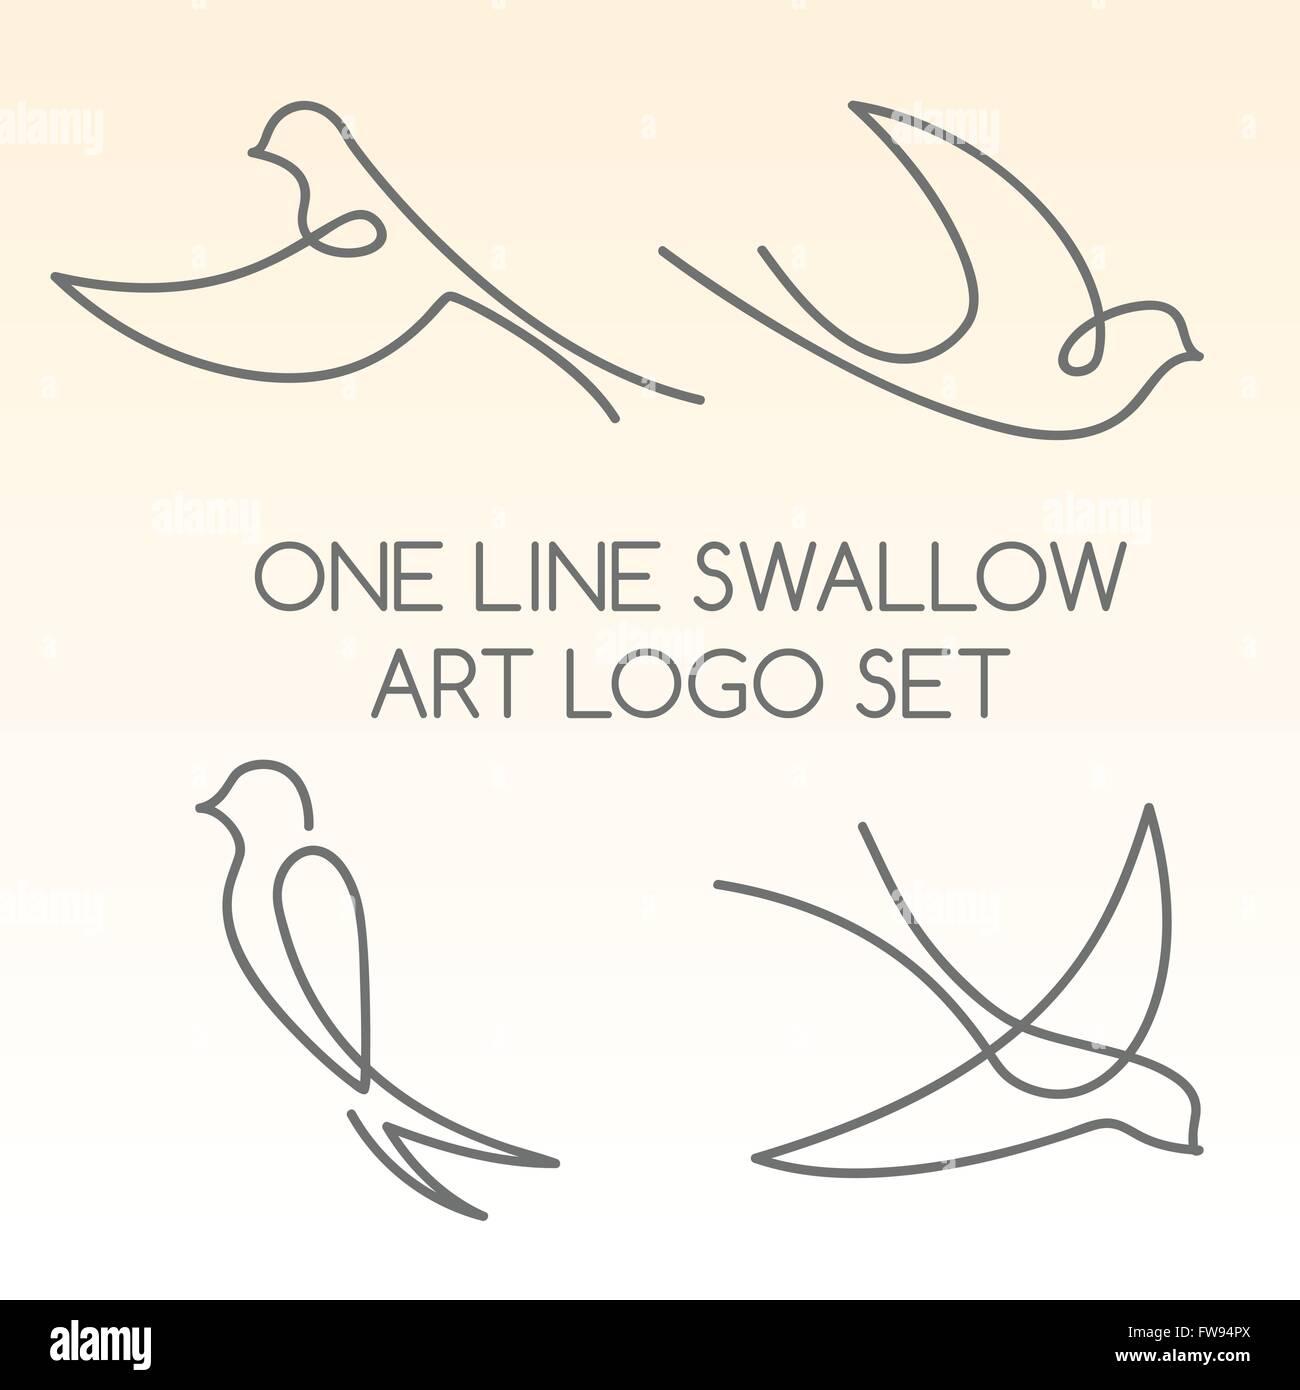 One line swallow art logo set - Stock Vector